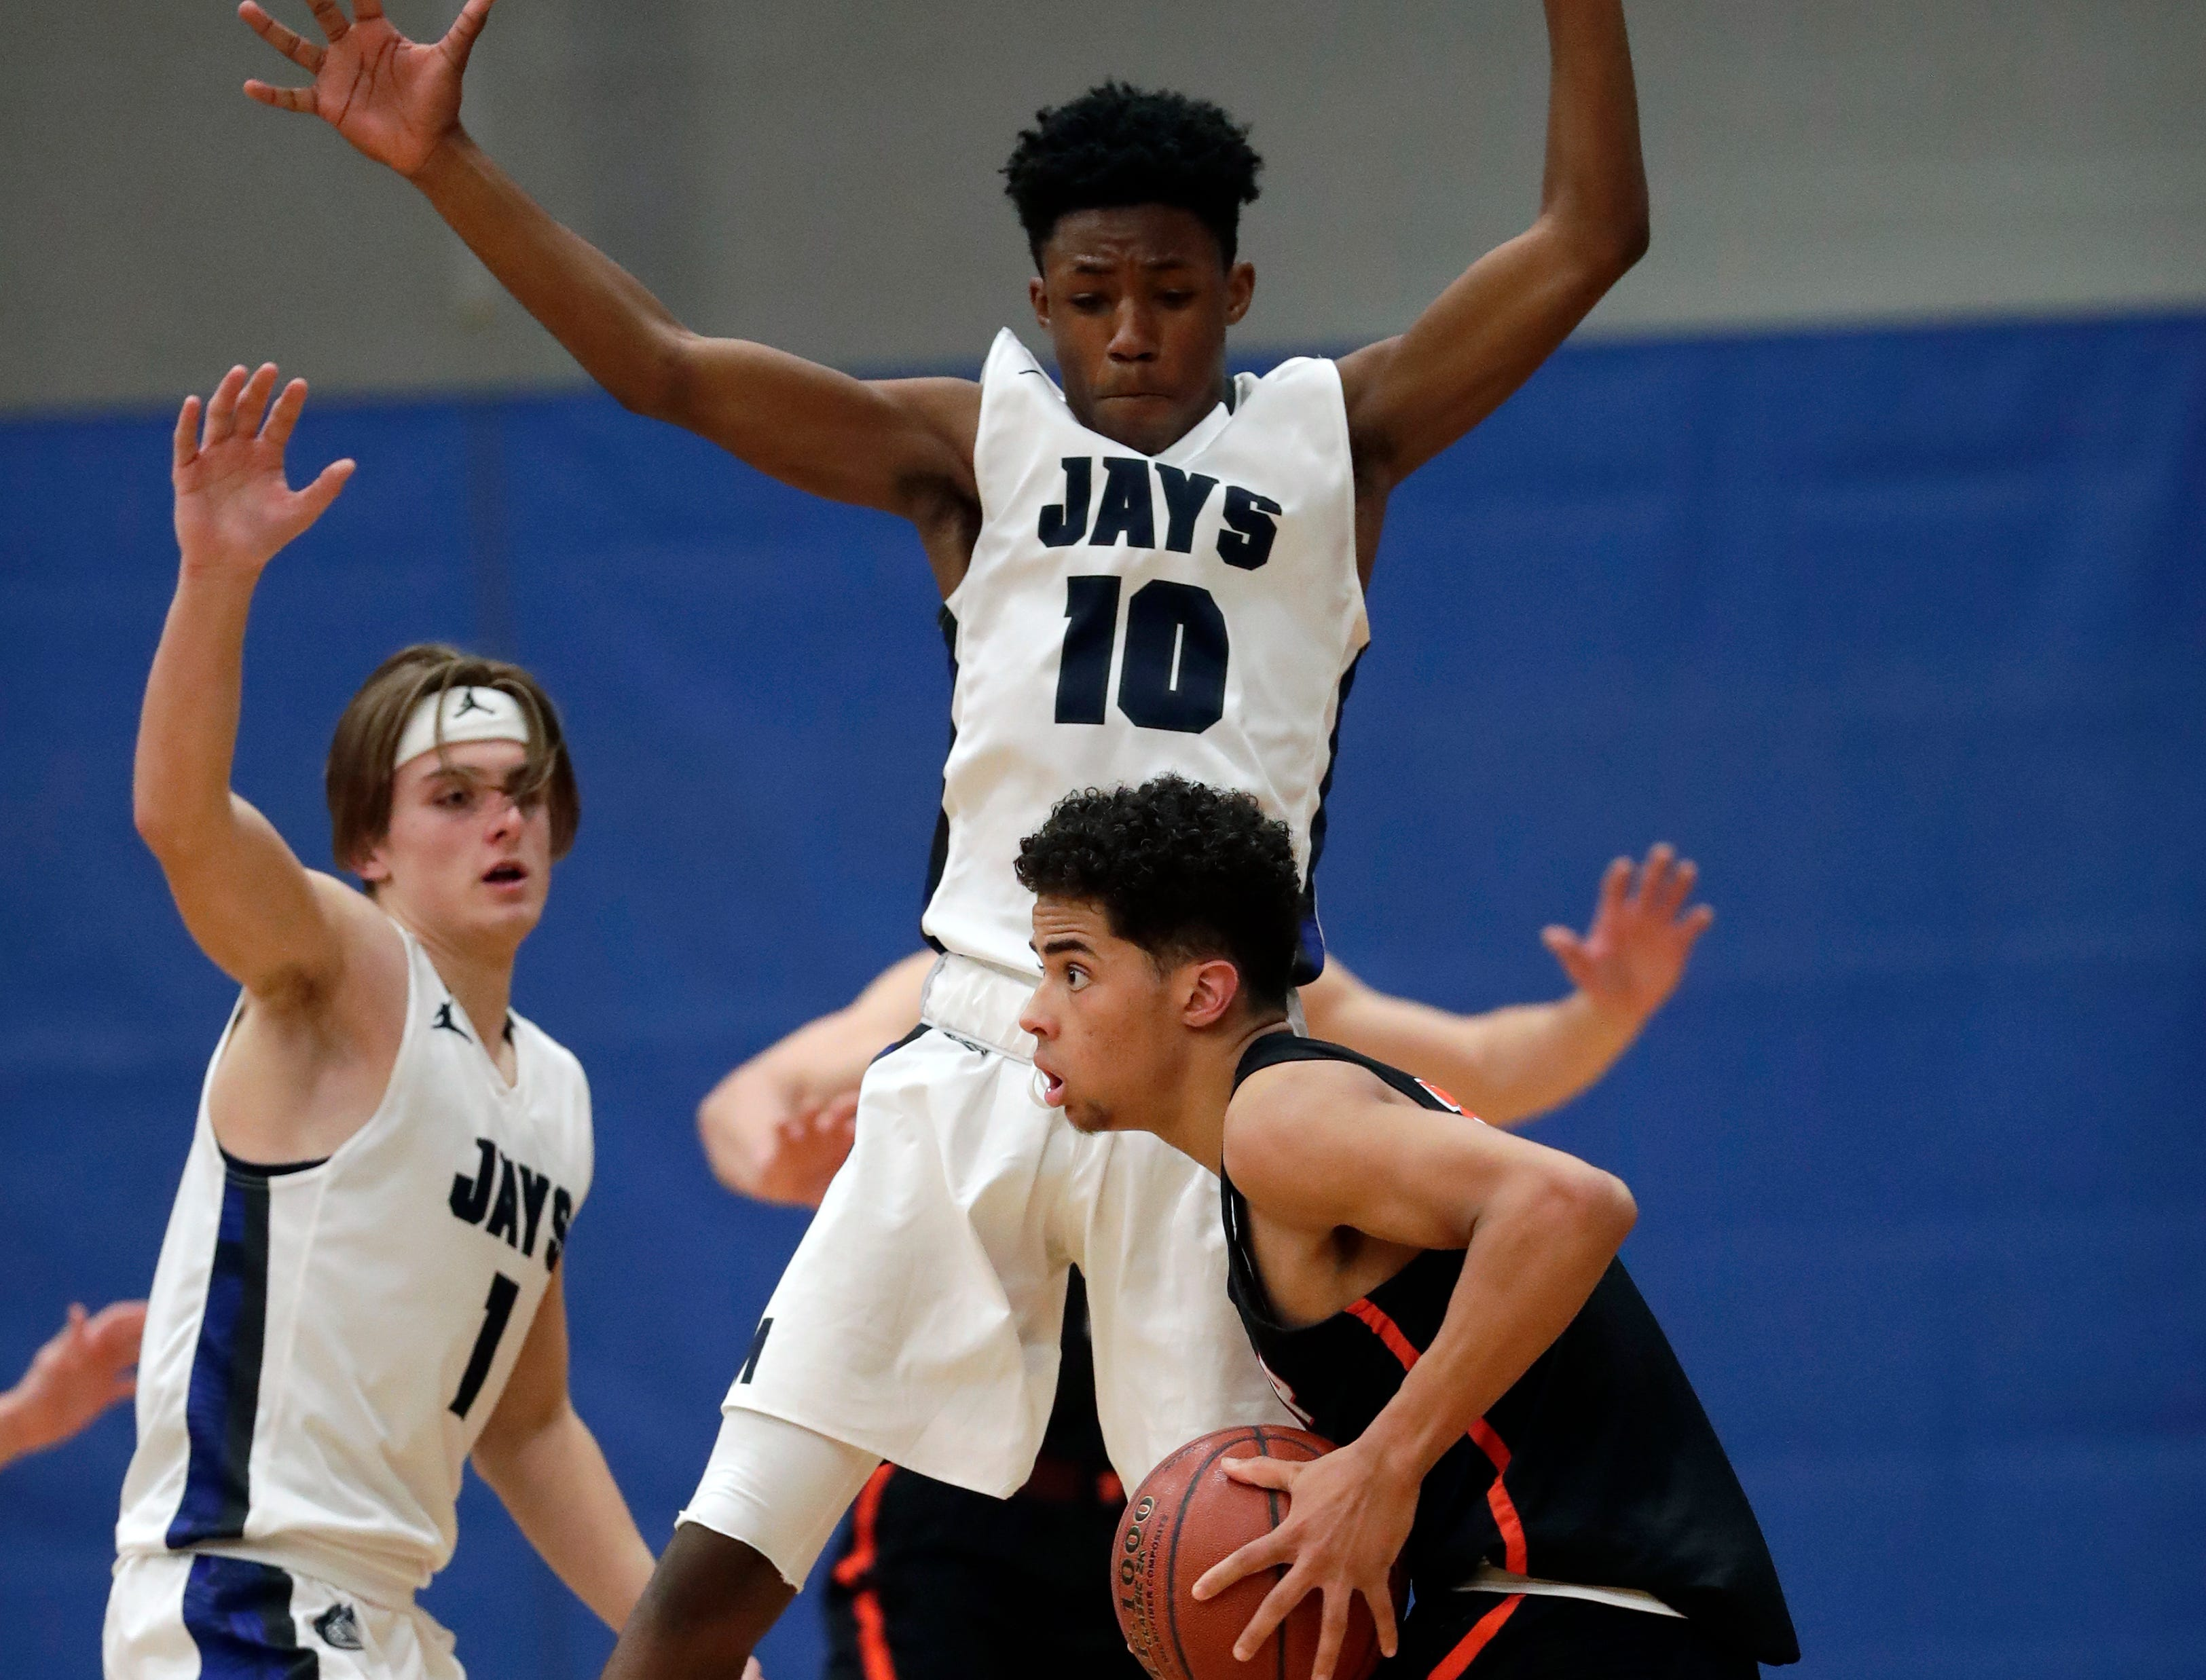 Menasha High School's Jalen Womack (10) defends against West De Pere High School's Jovan Webb (14) during their boys basketball game Tuesday, December 11, 2018, in Menasha, Wis. Dan Powers/USA TODAY NETWORK-Wisconsin